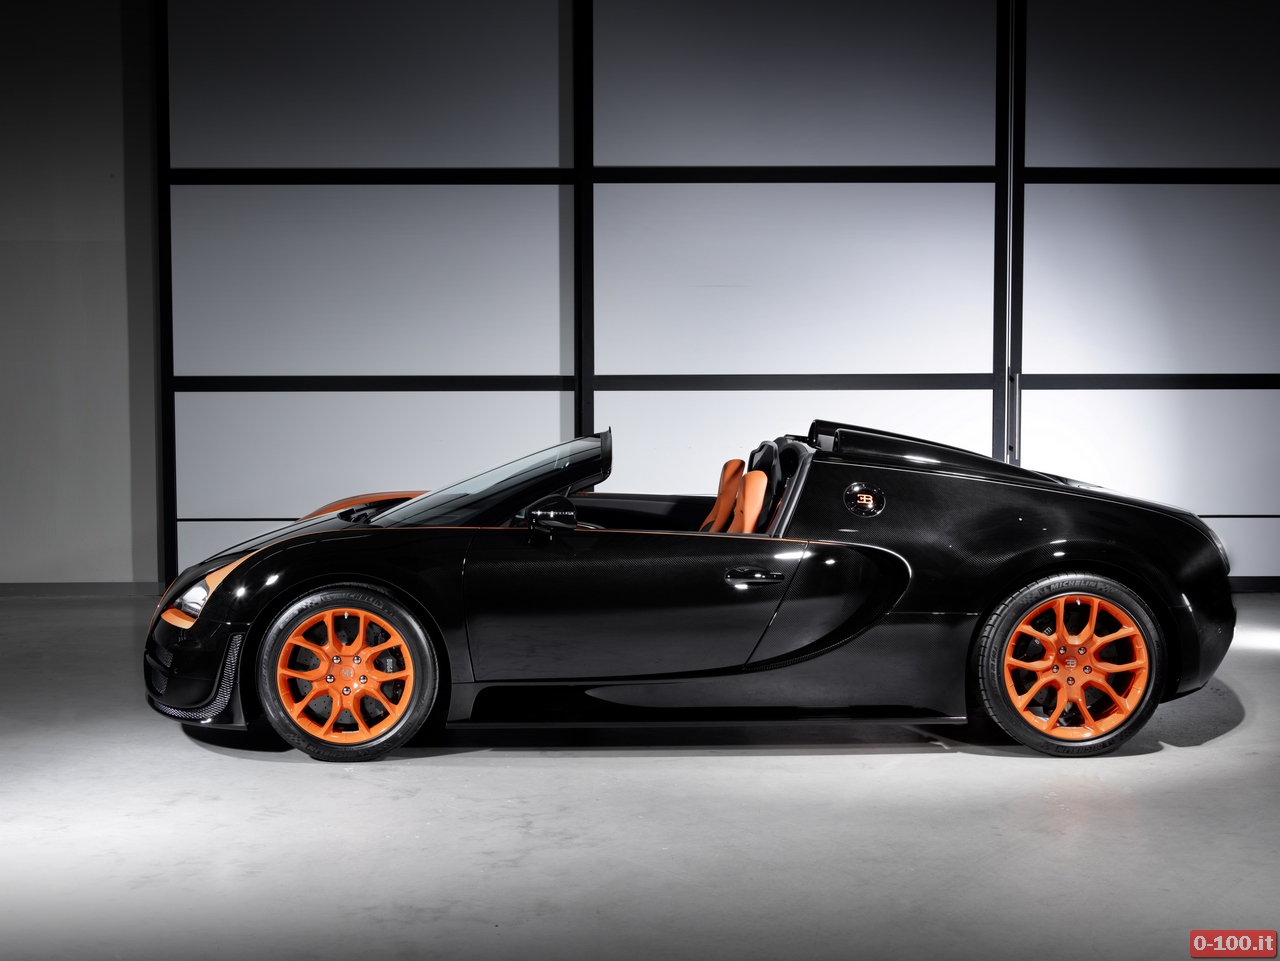 bugatti-veyron-16-4-grand-sport-vitesse-debutto-a-shanghai_0-100_2